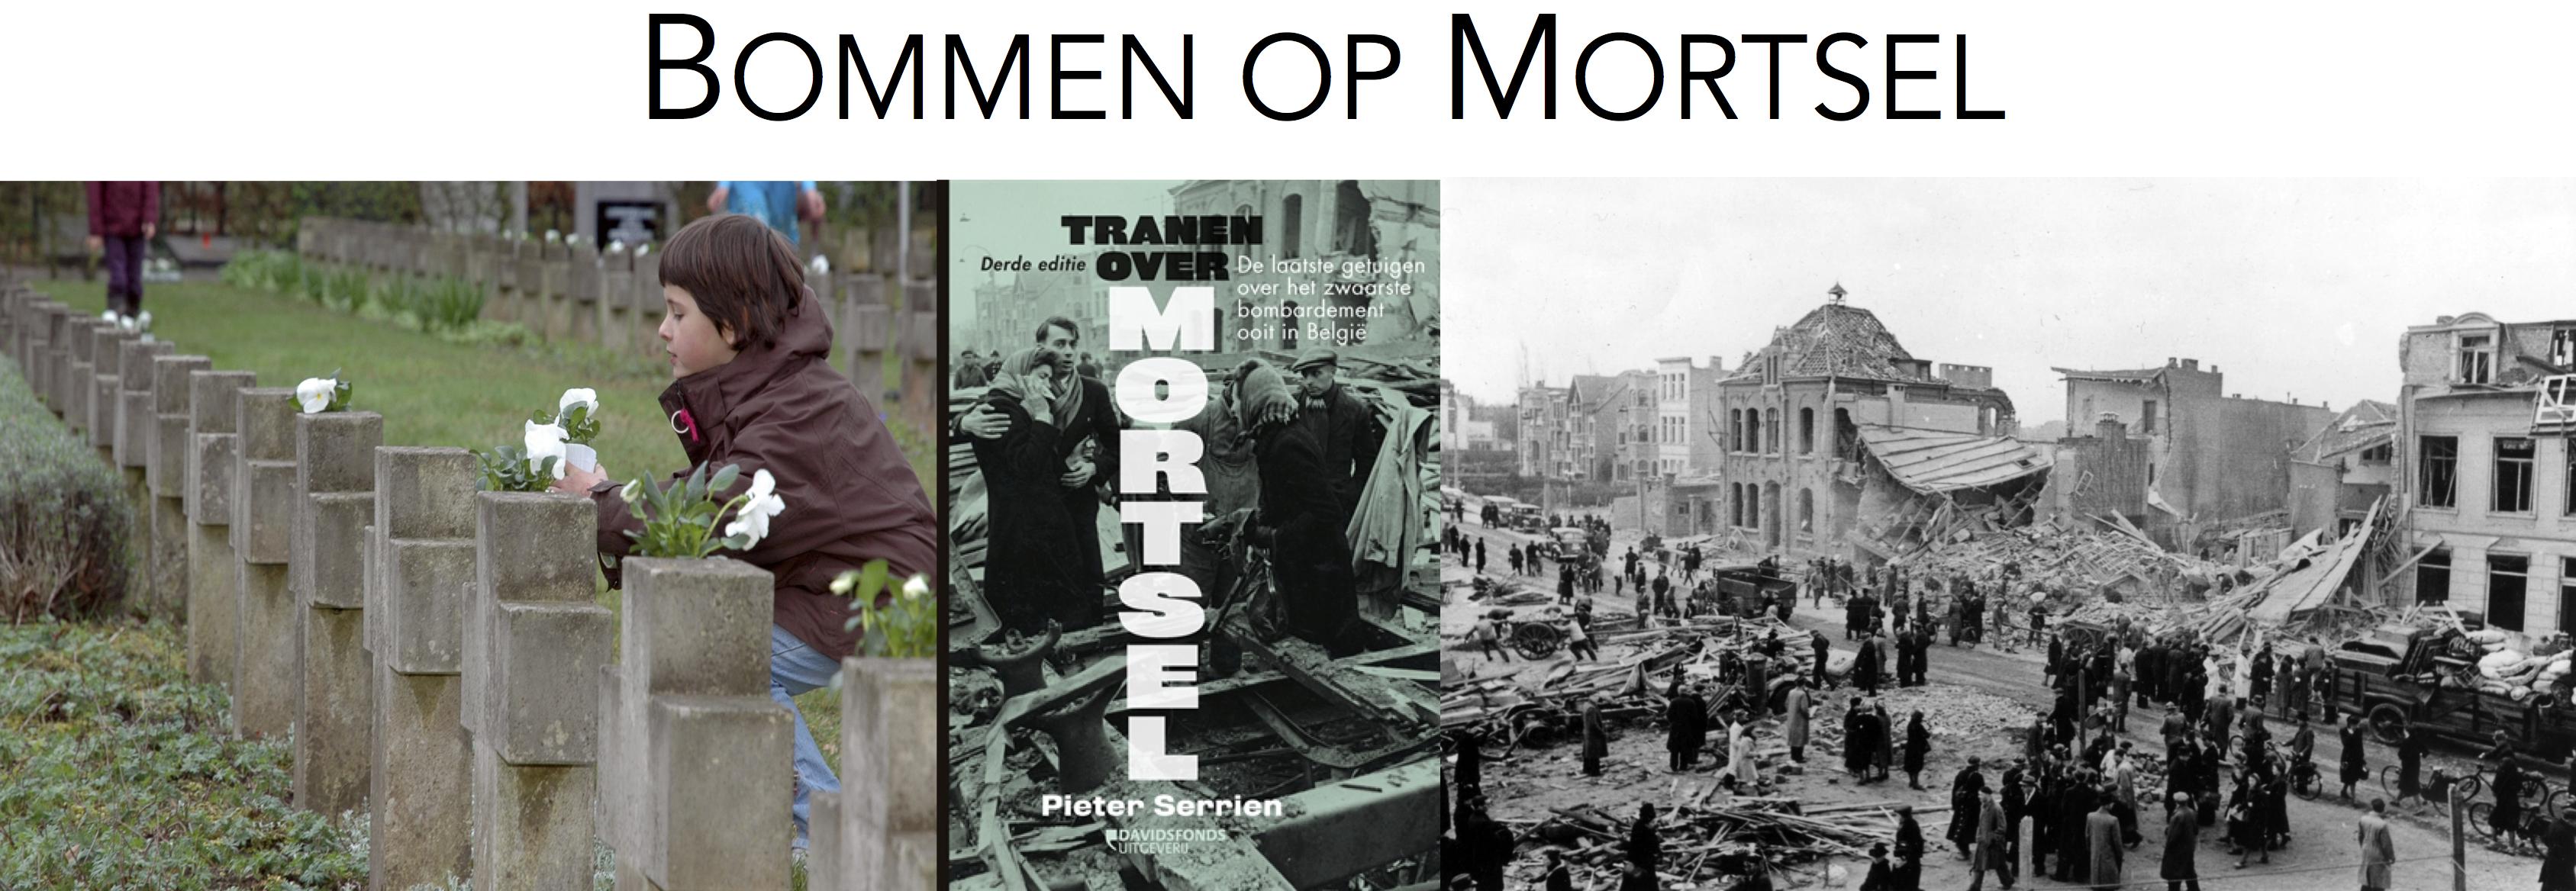 Bommen op Mortsel - lezing Pieter Serrien